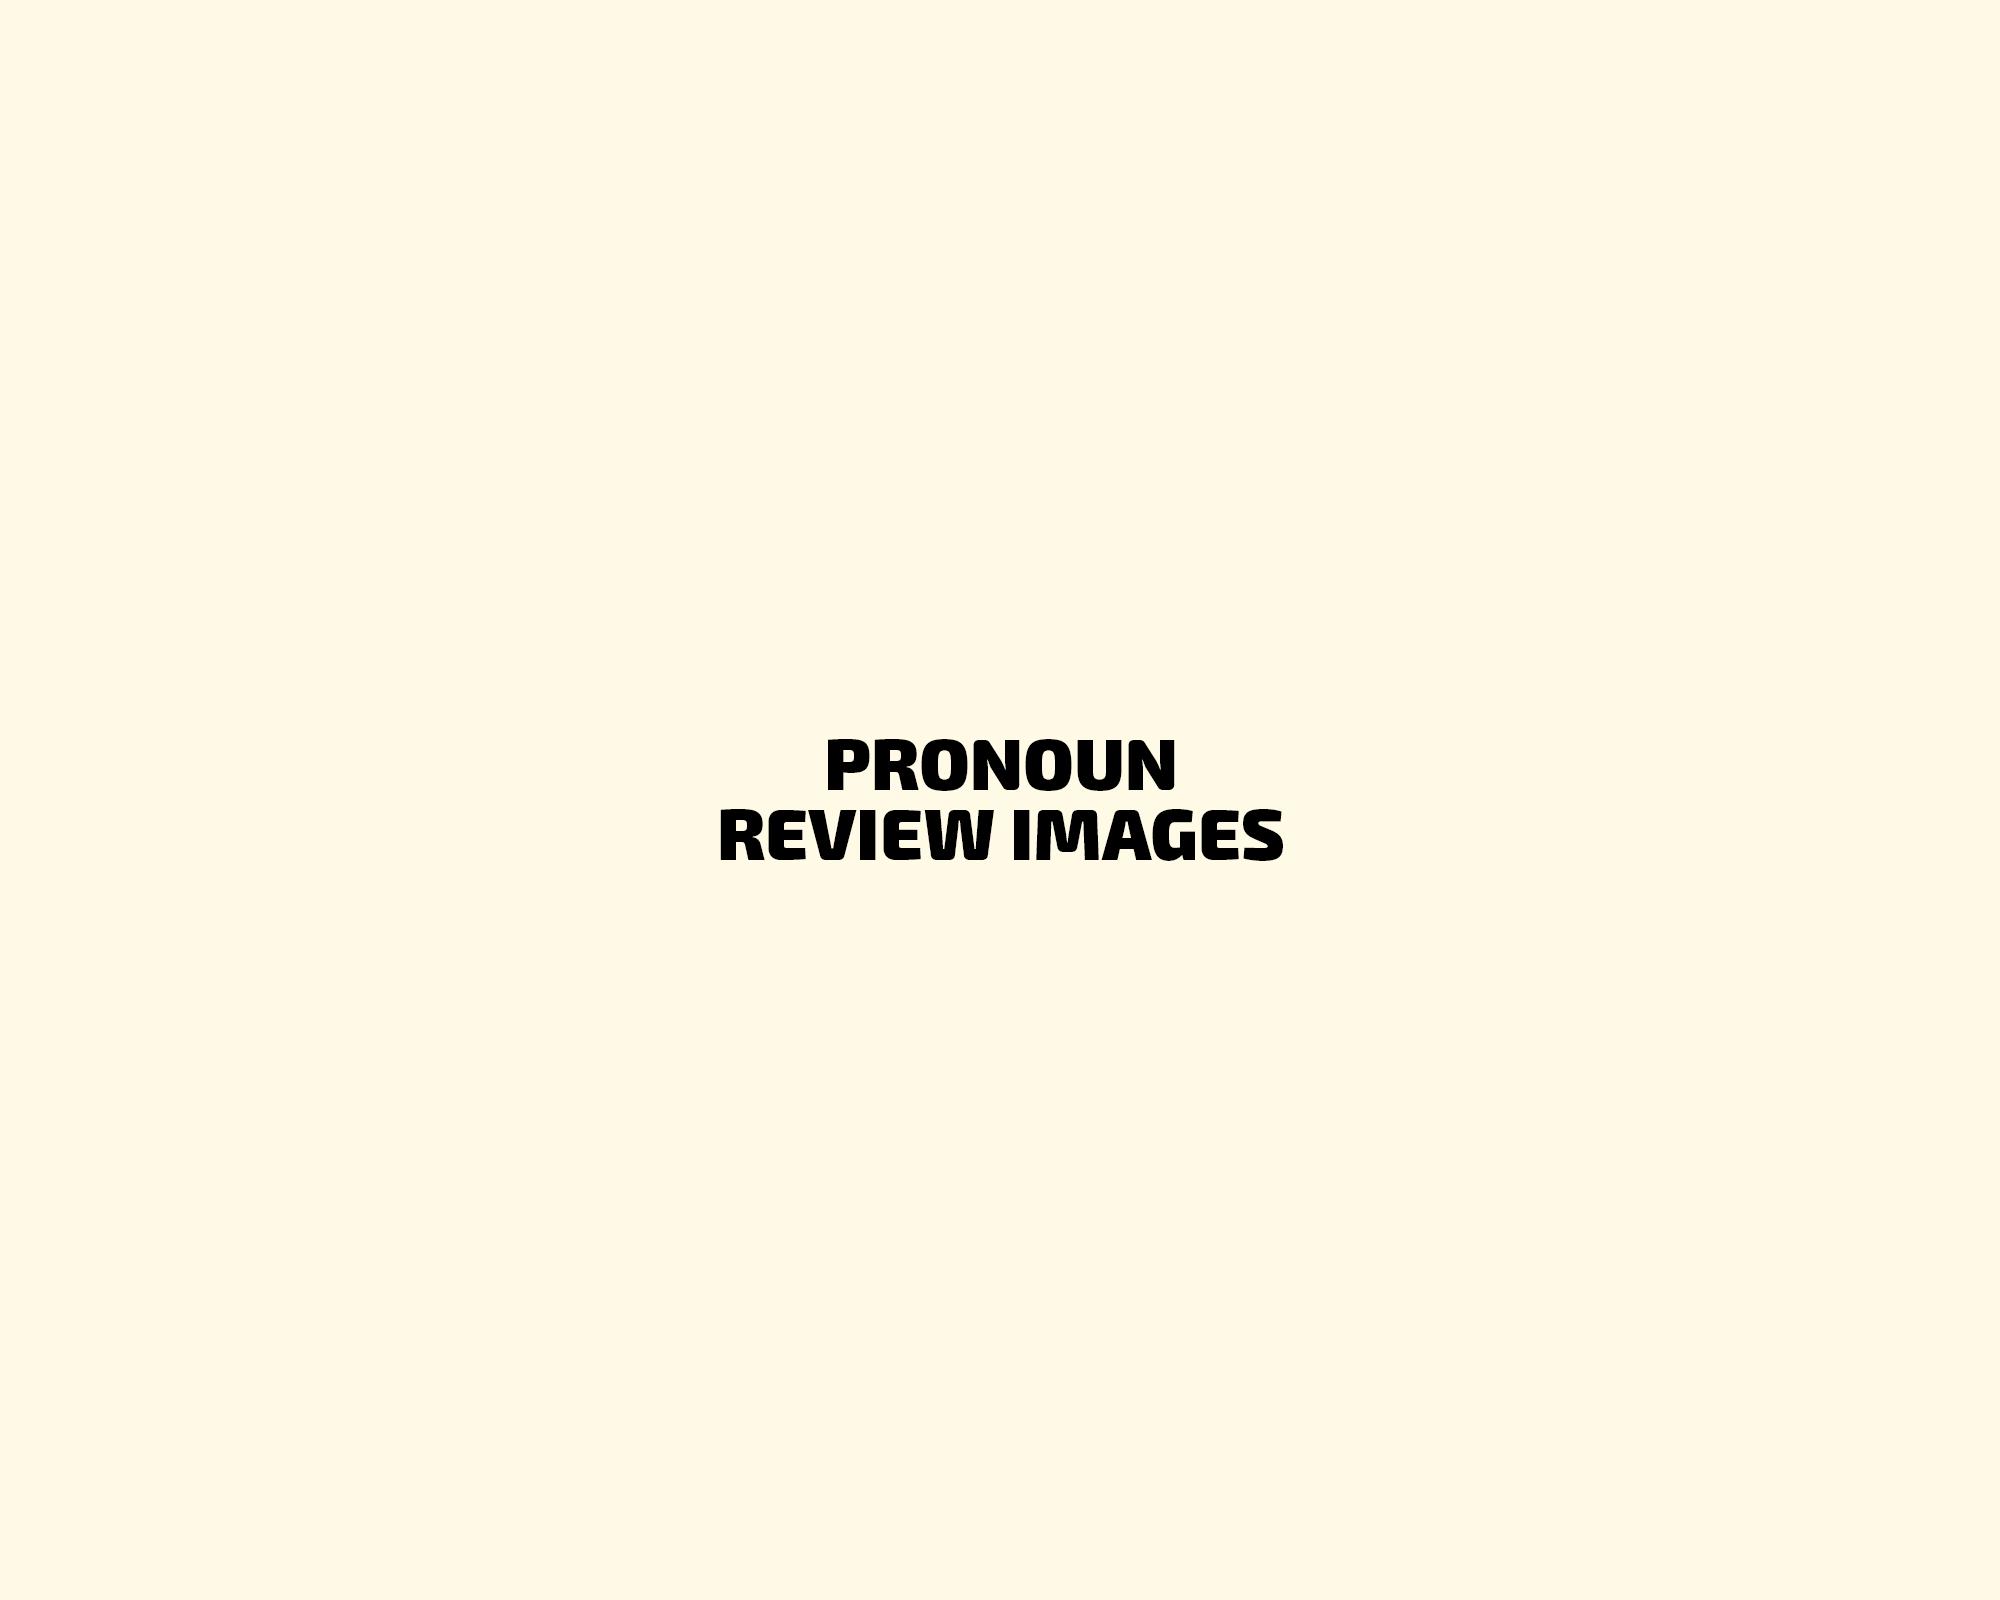 b-pronouns-gallery